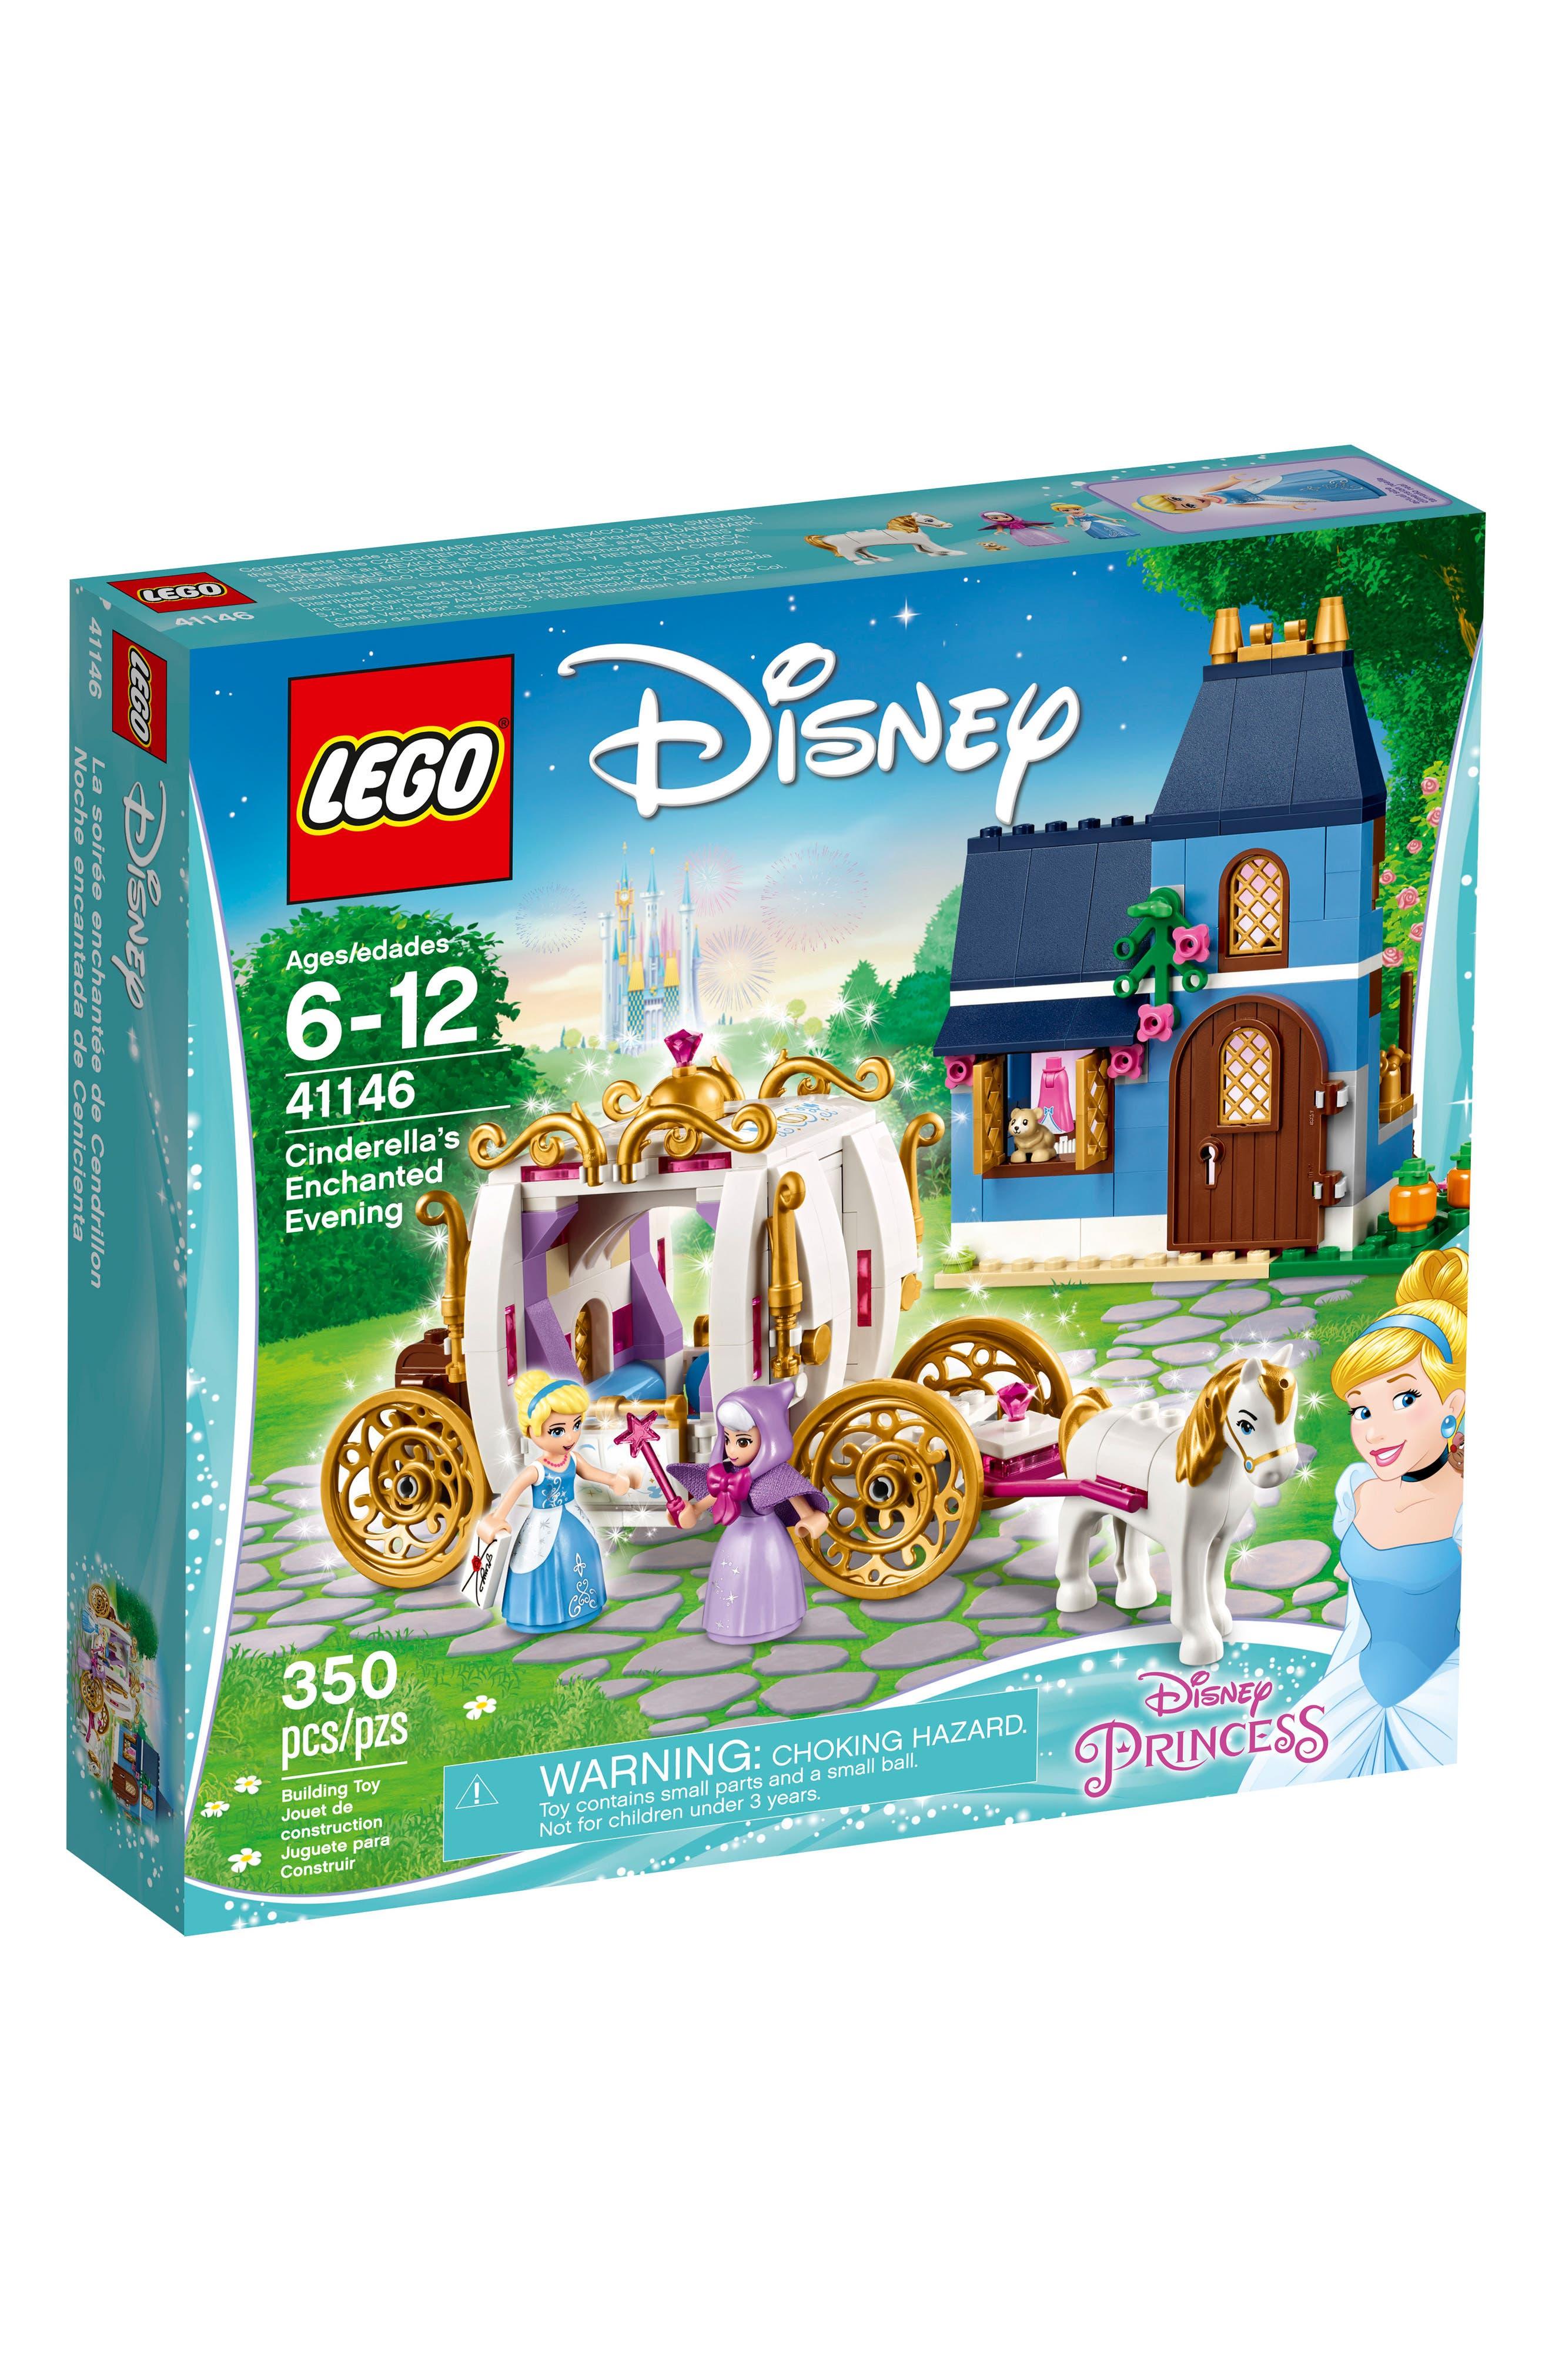 Main Image - LEGO® Disney™ Cinderella's Enchanted Evening Play Set - 41146